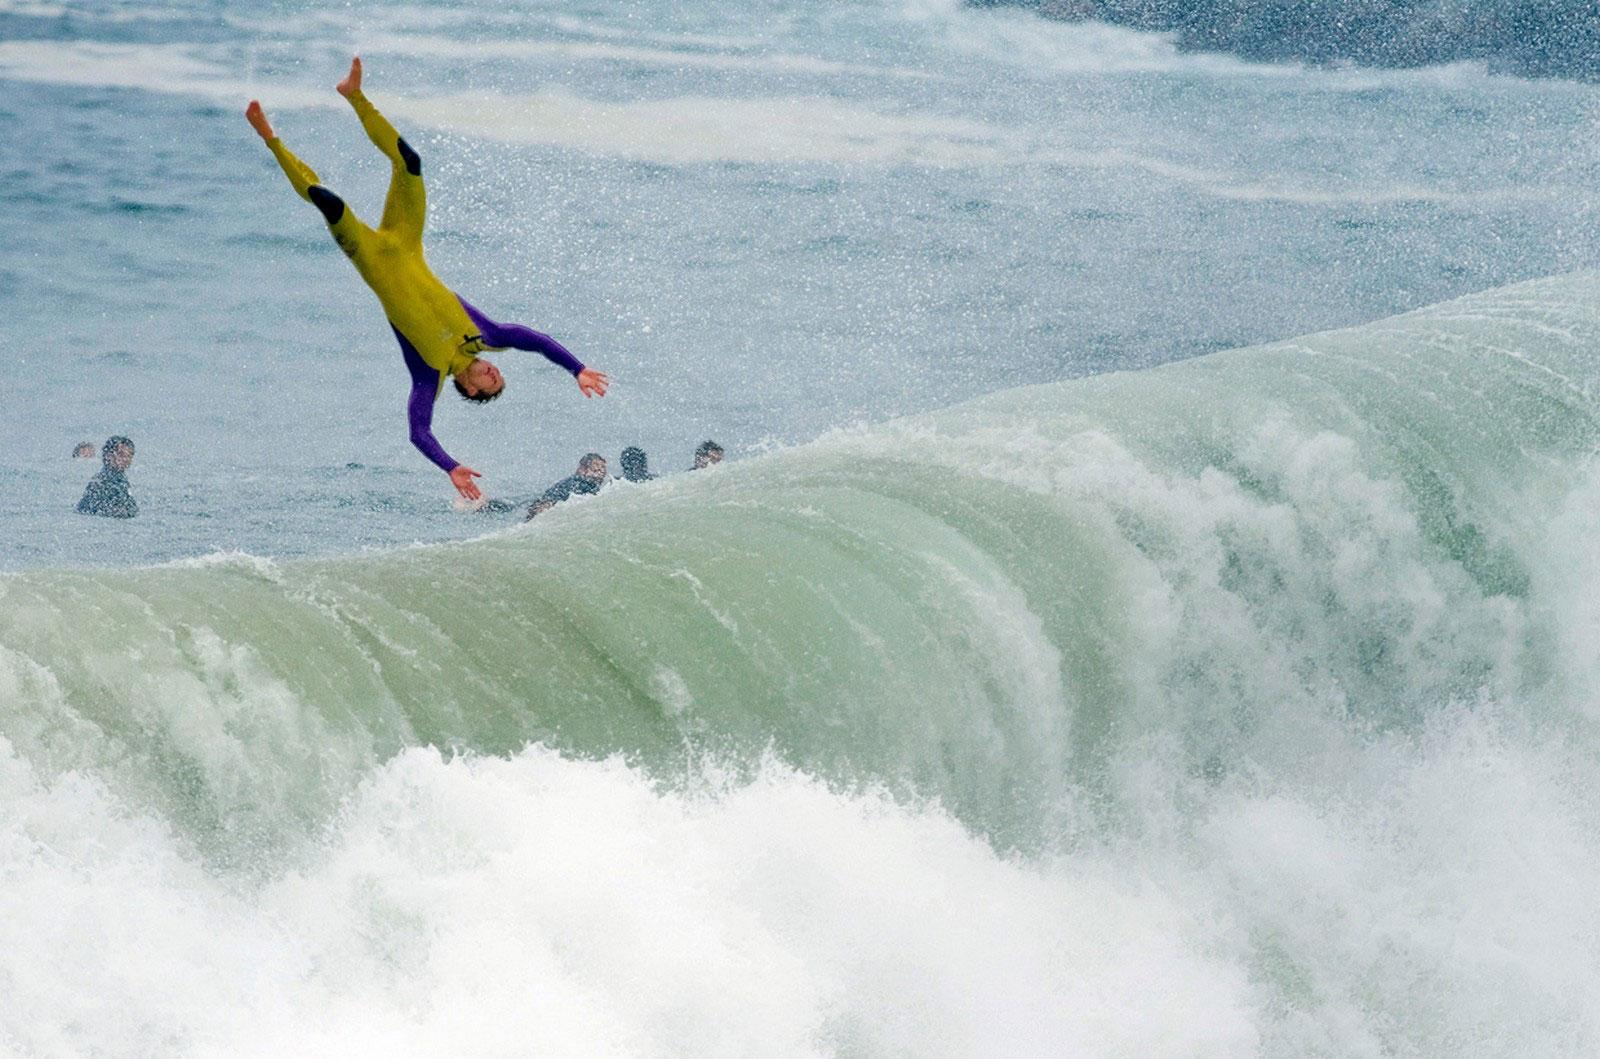 Падение серфингиста с доски